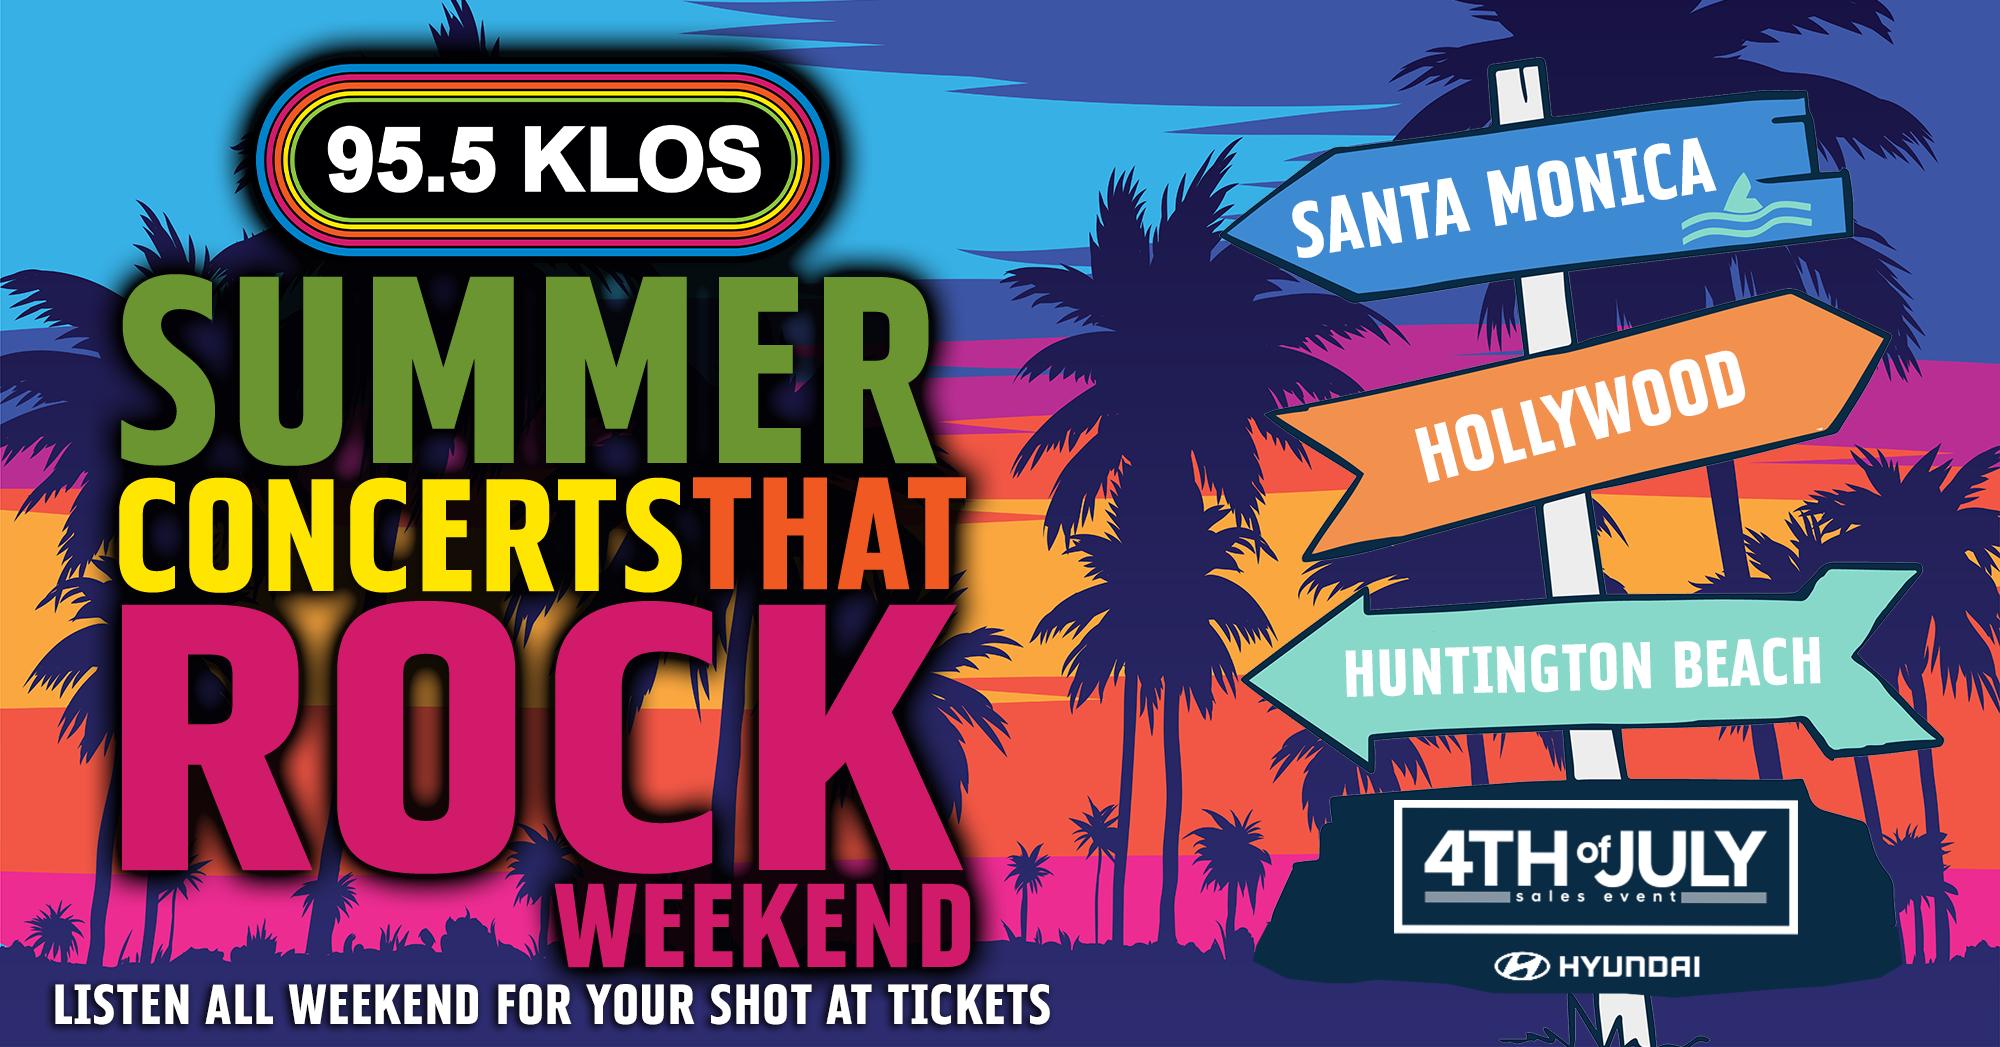 Summer Concerts That Rock Weekend!